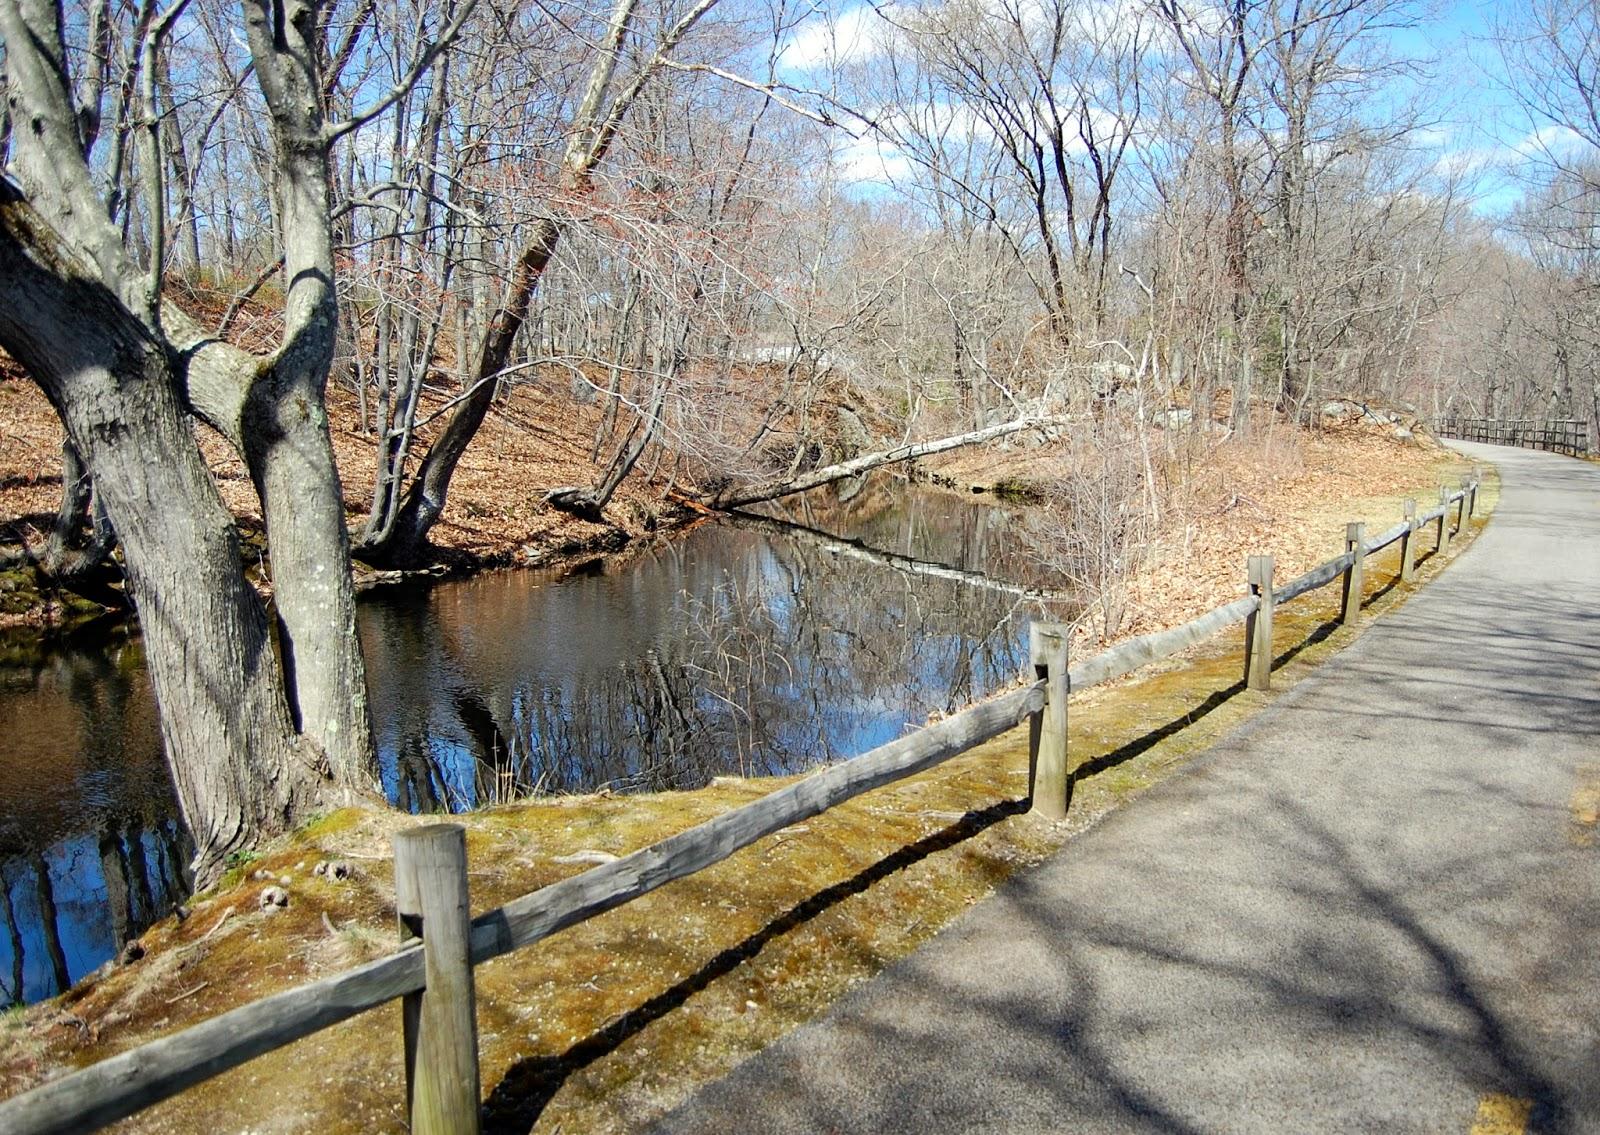 on the Blackstone River Bike Path near mile 10.5